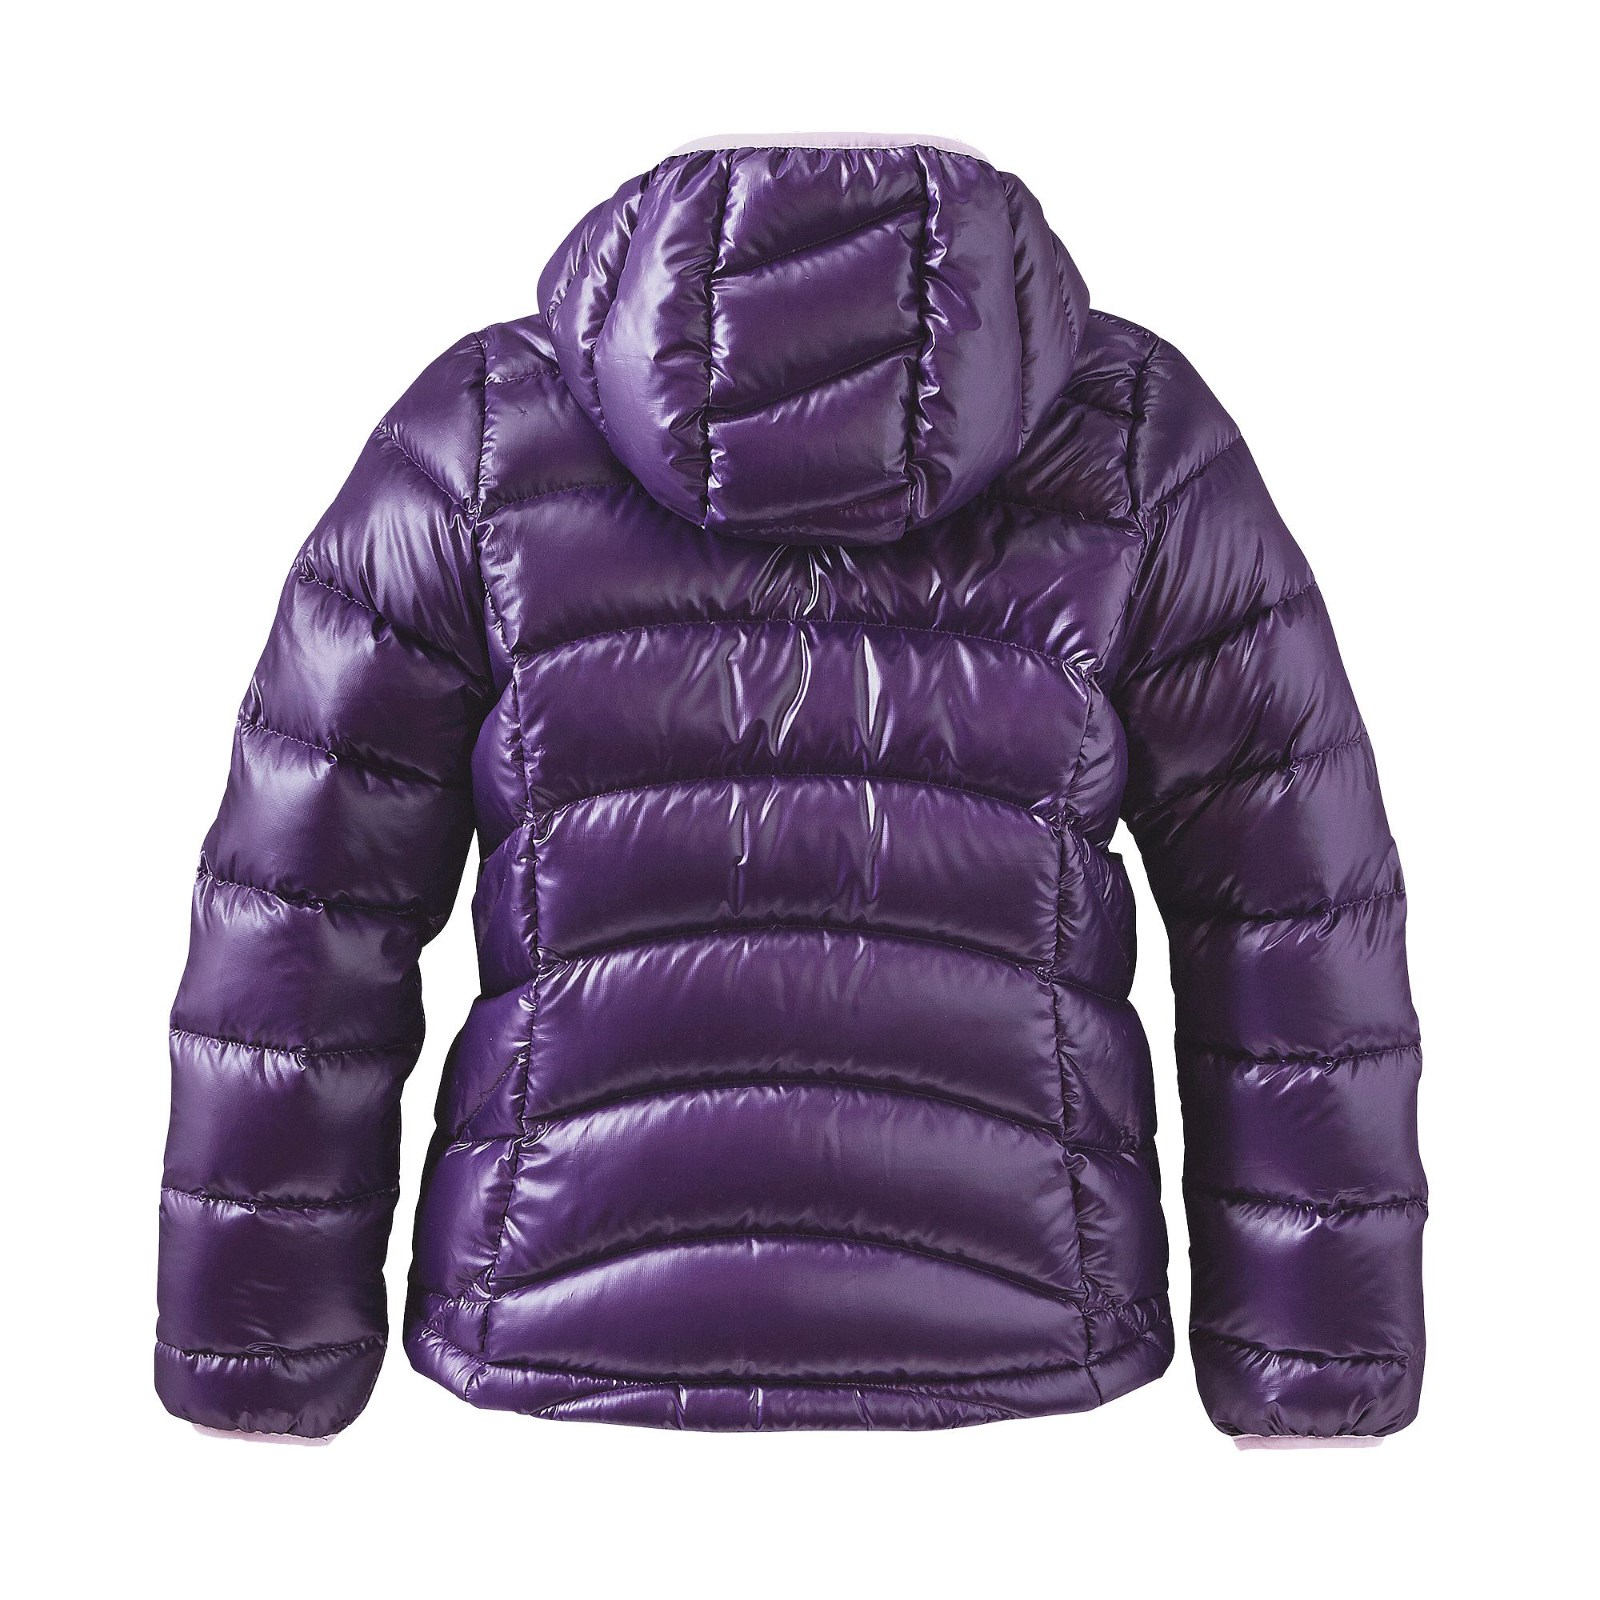 Girls' Down Jacket Hoody Manufacturers, Girls' Down Jacket Hoody Factory, Supply Girls' Down Jacket Hoody